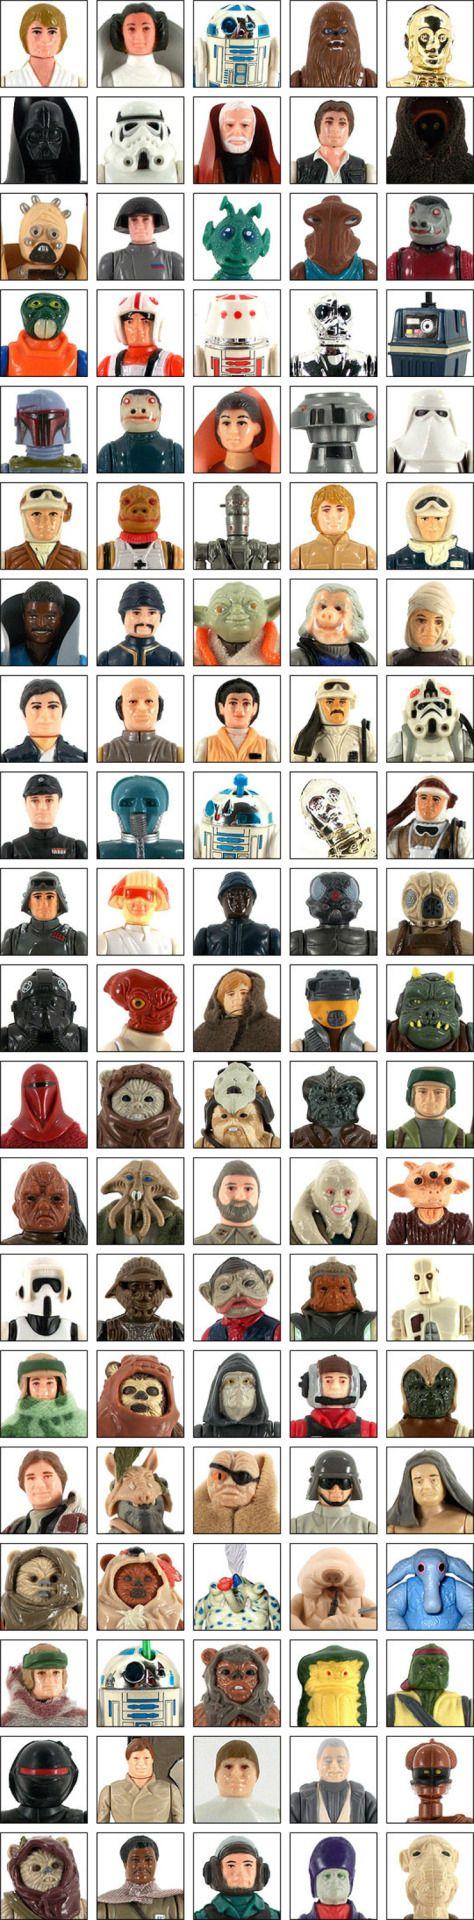 Star Wars: The Complete Vintage Kenner Collection